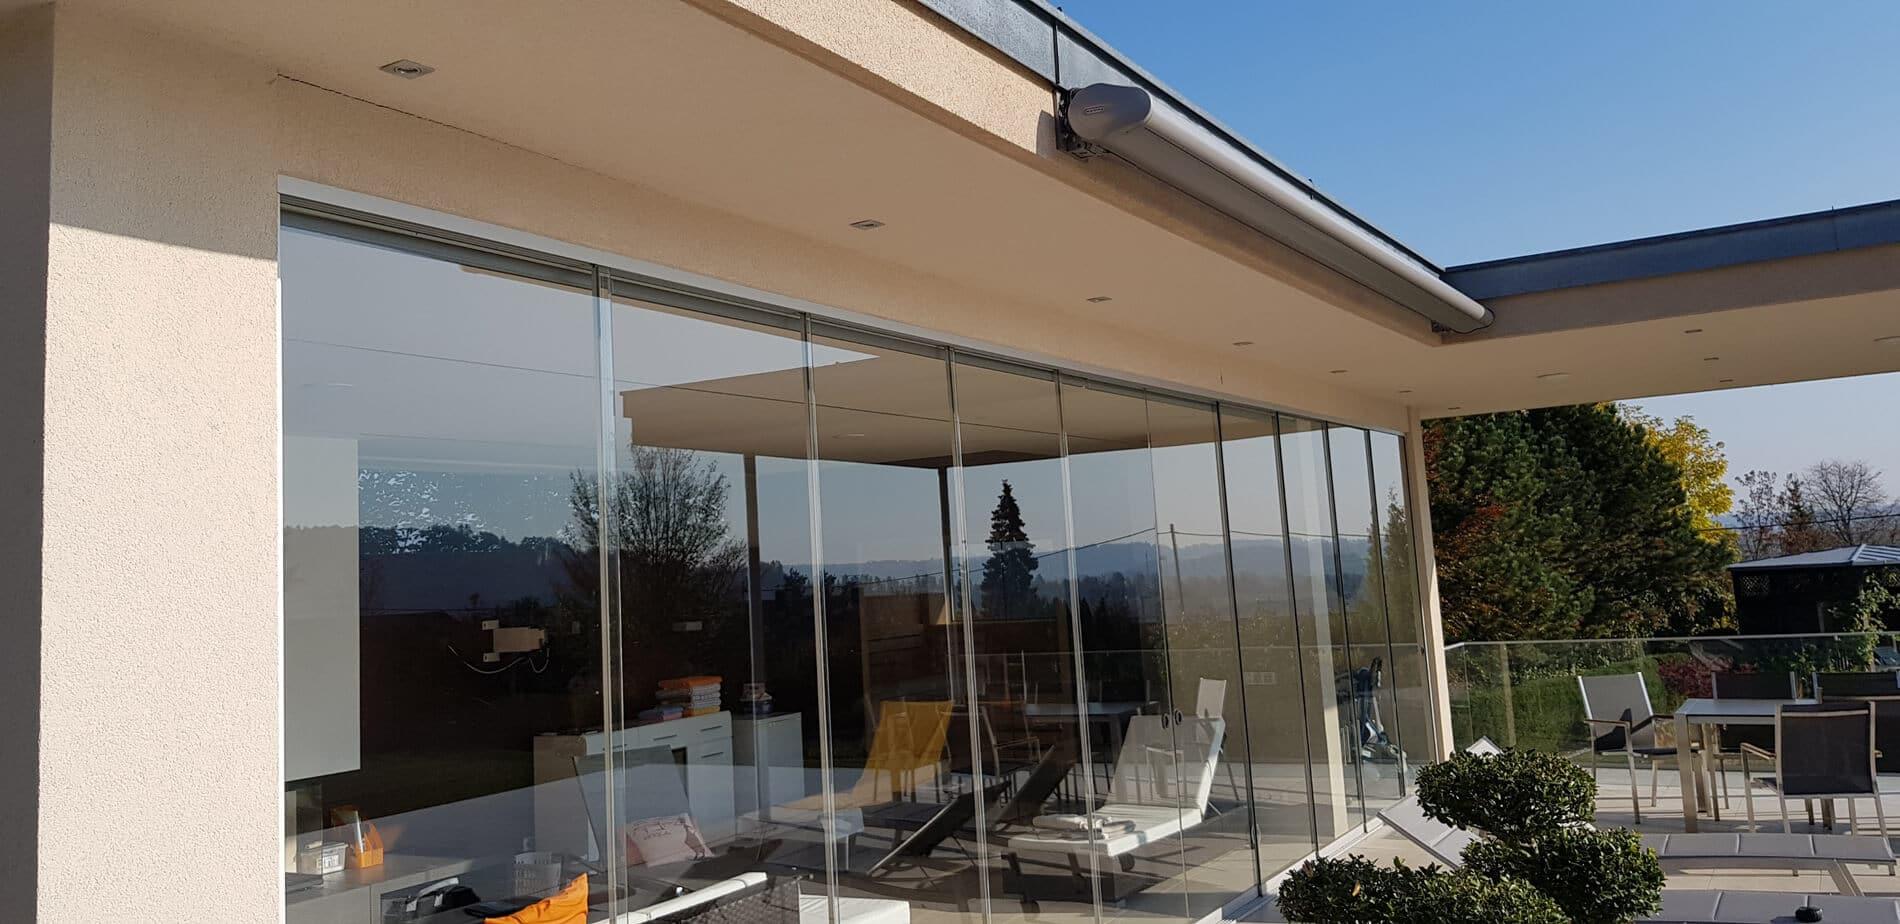 glasschiebet ren au en f r terrasse oder balkonverglasung. Black Bedroom Furniture Sets. Home Design Ideas